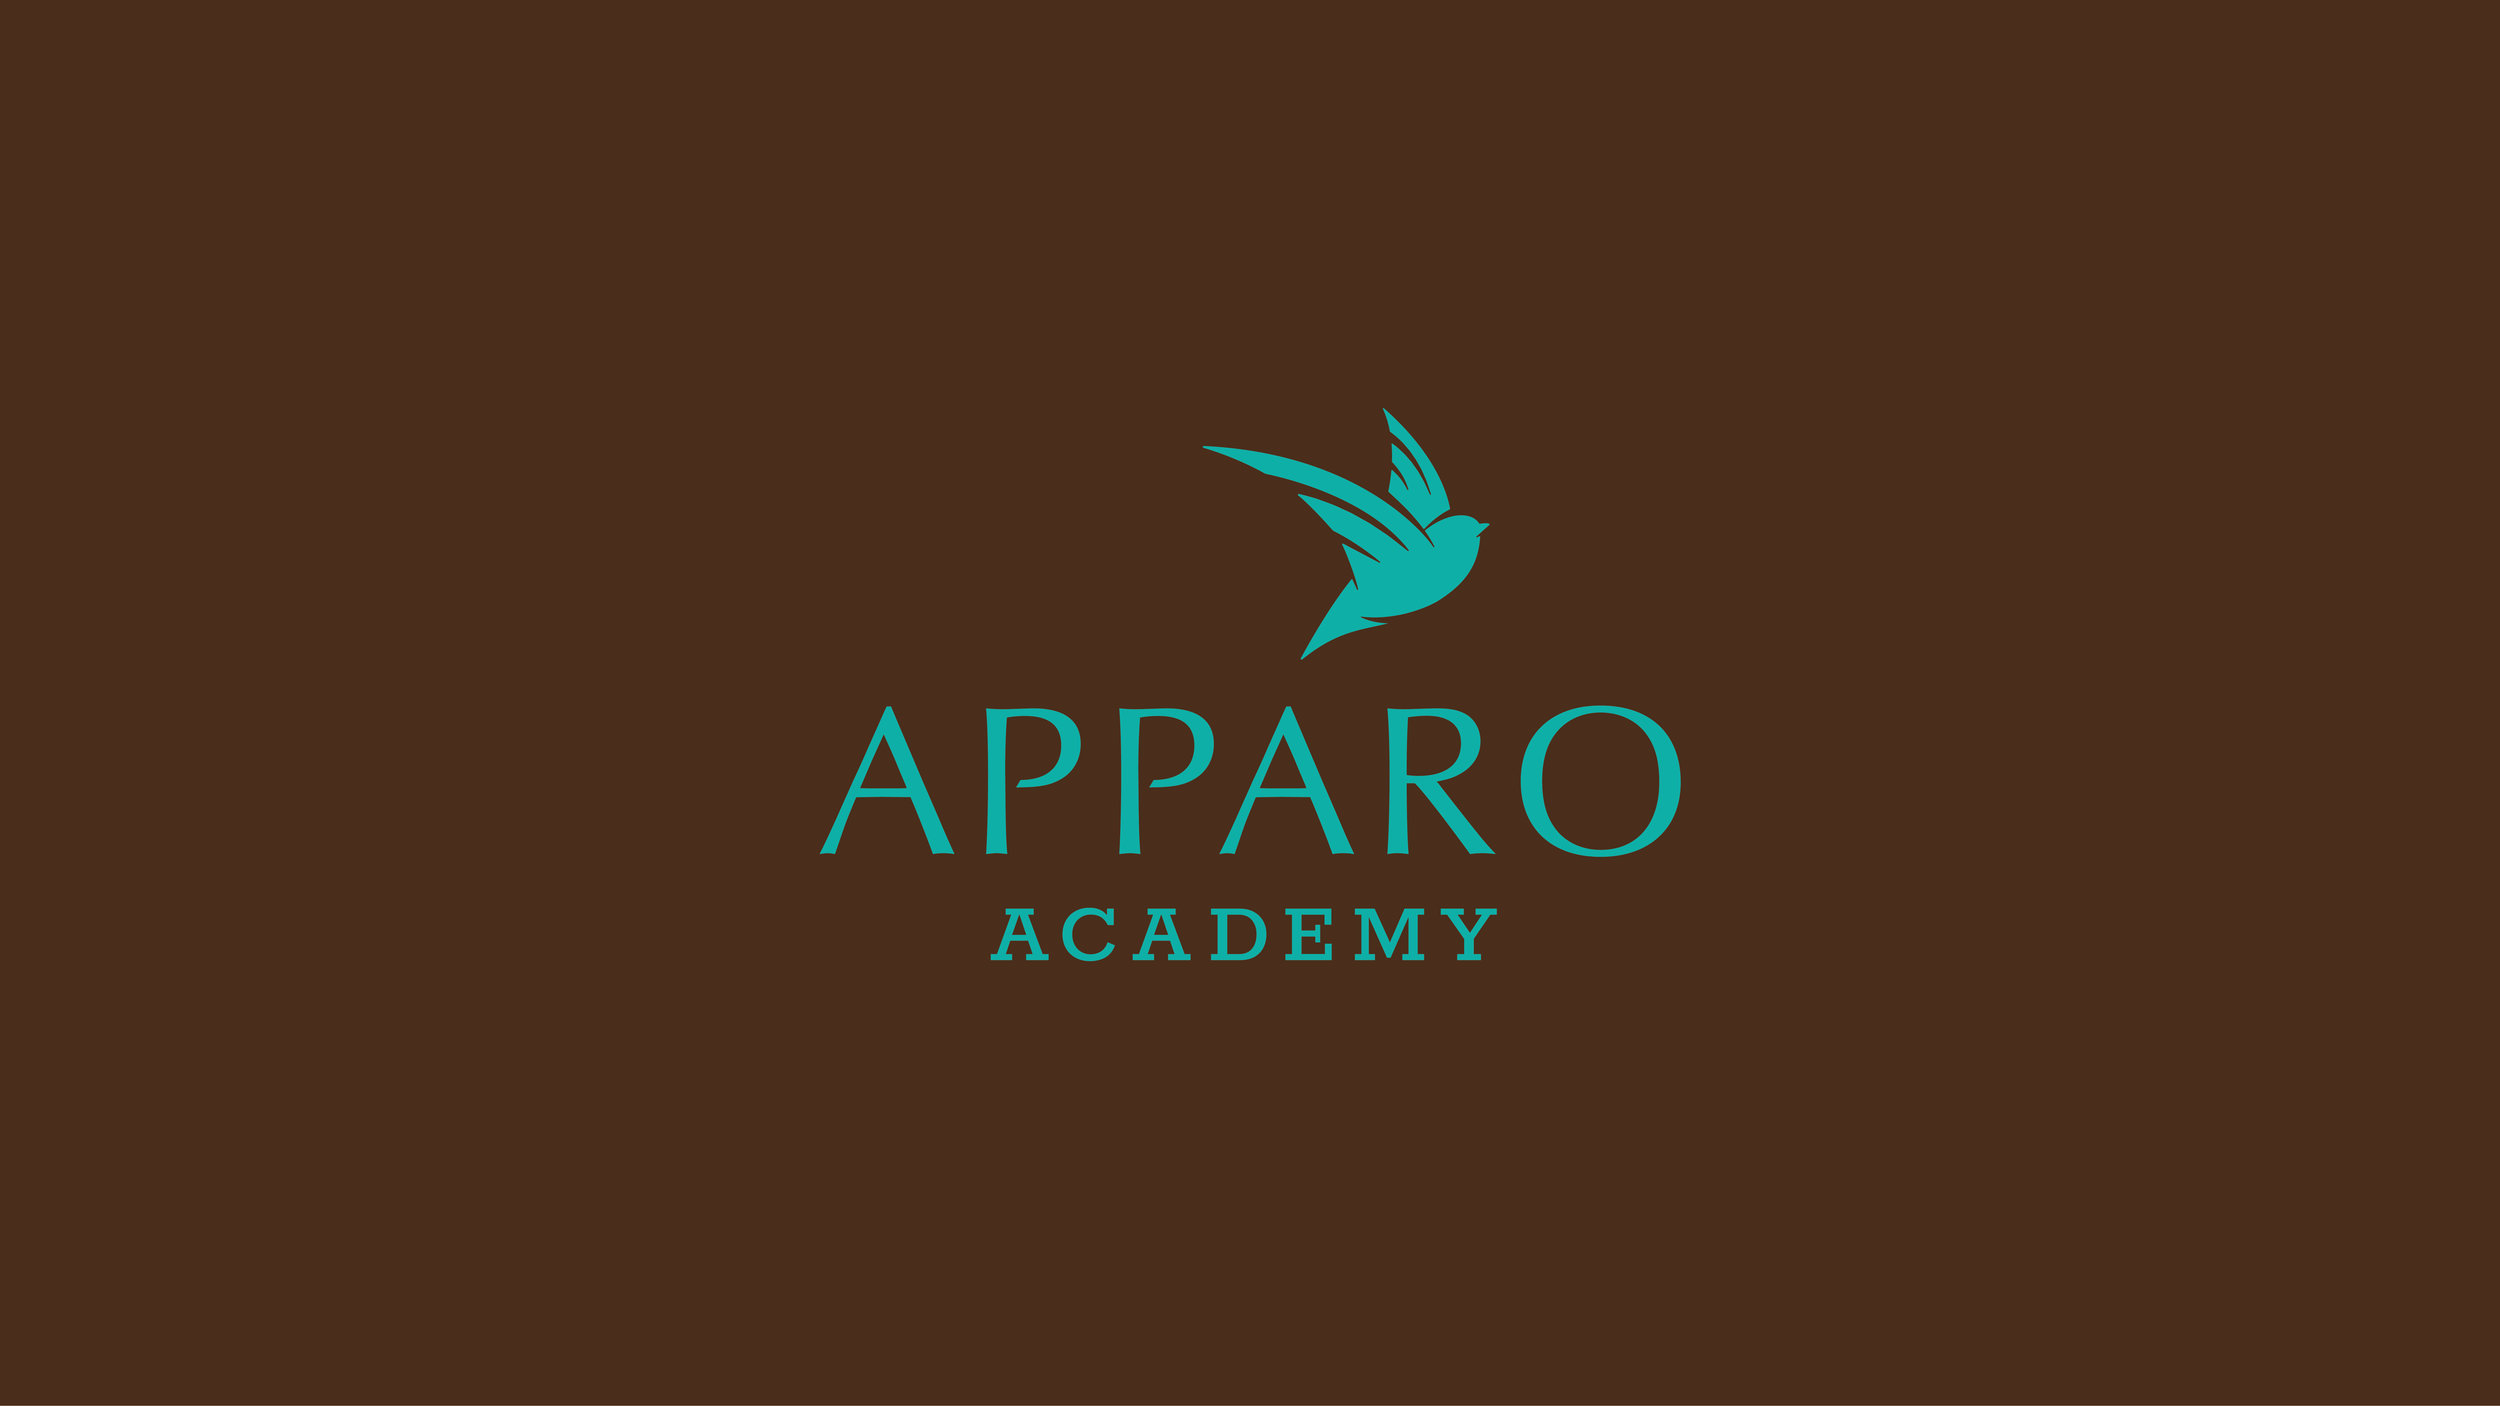 Apparo_Logo_Primary_Turquoise_CMYK-02.jpg